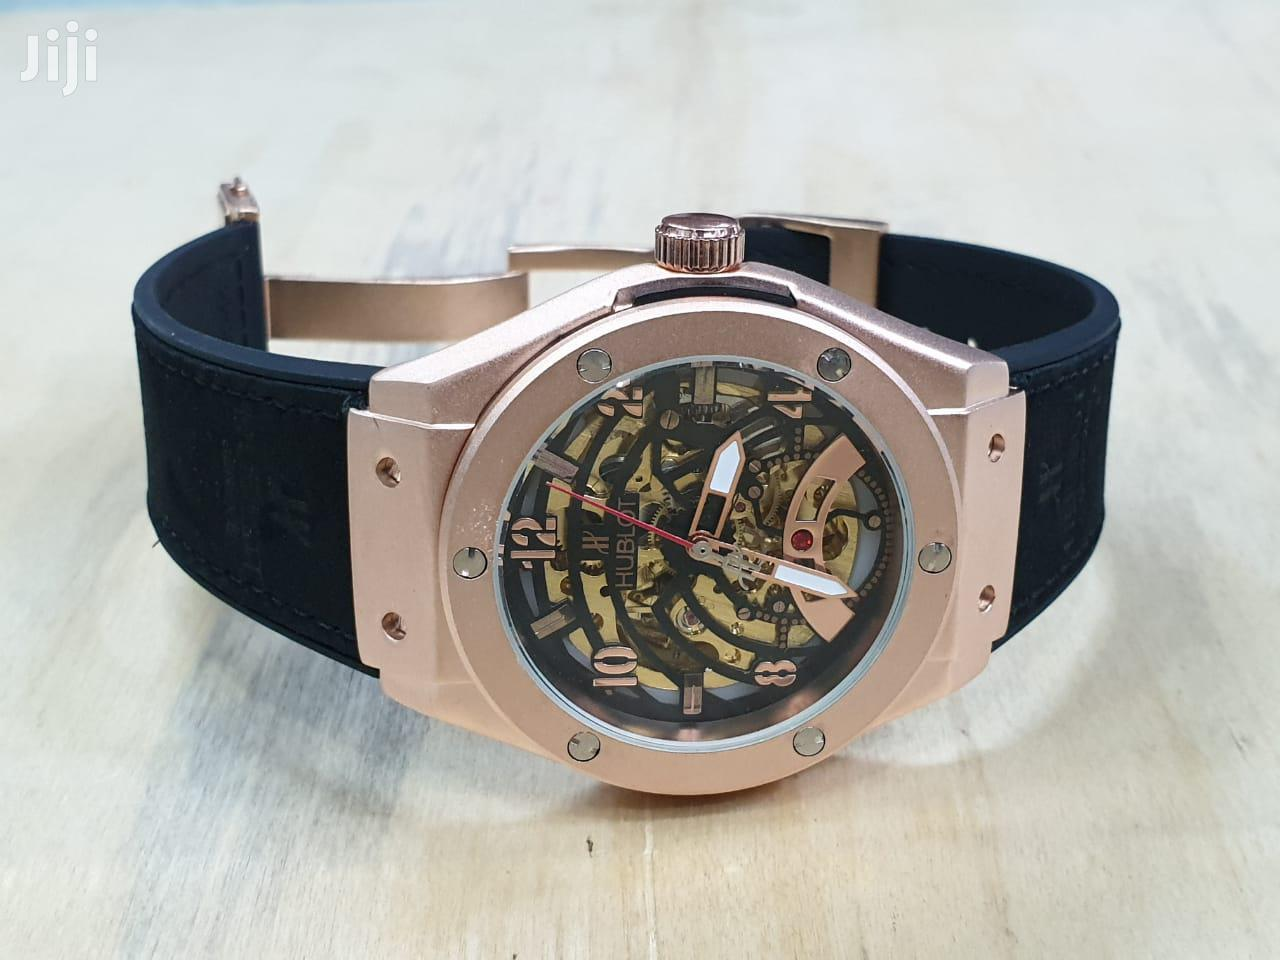 Hublot Watches | Watches for sale in Nairobi Central, Nairobi, Kenya